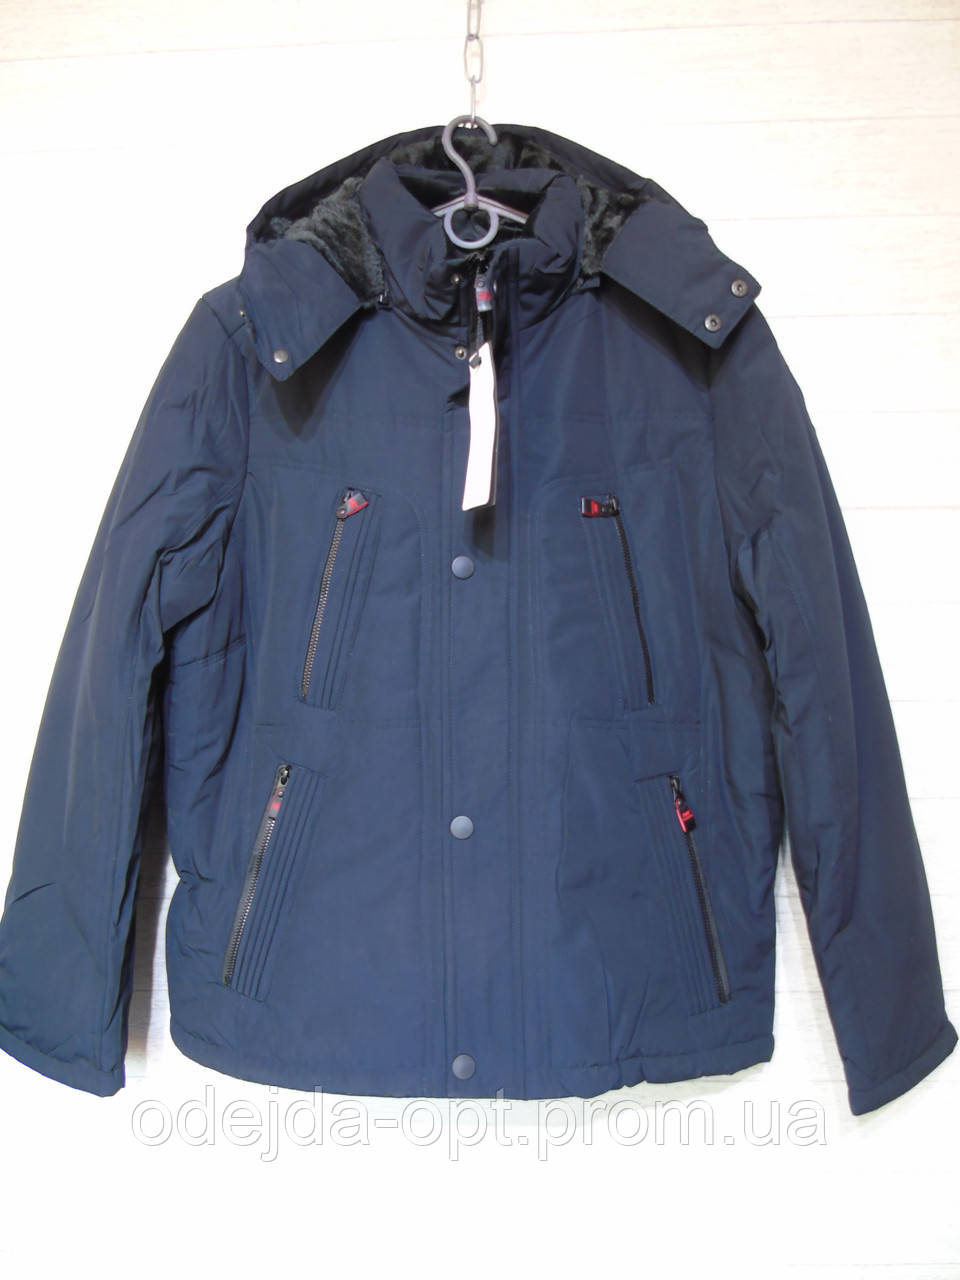 Куртка мужская ботал зима